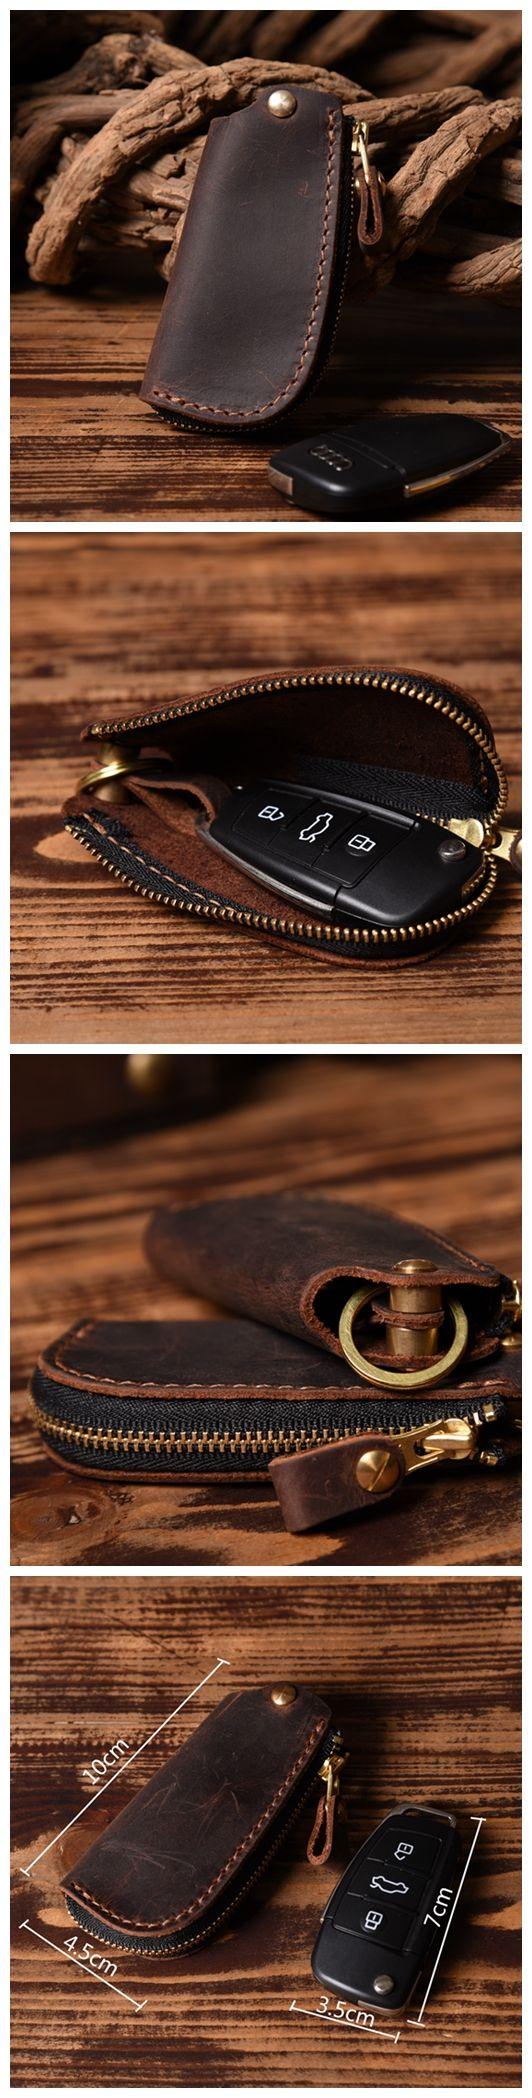 Handmade Genuine Leather Car Key Holder Leather Key Organizer Leather Key Chain Leather Case 14128